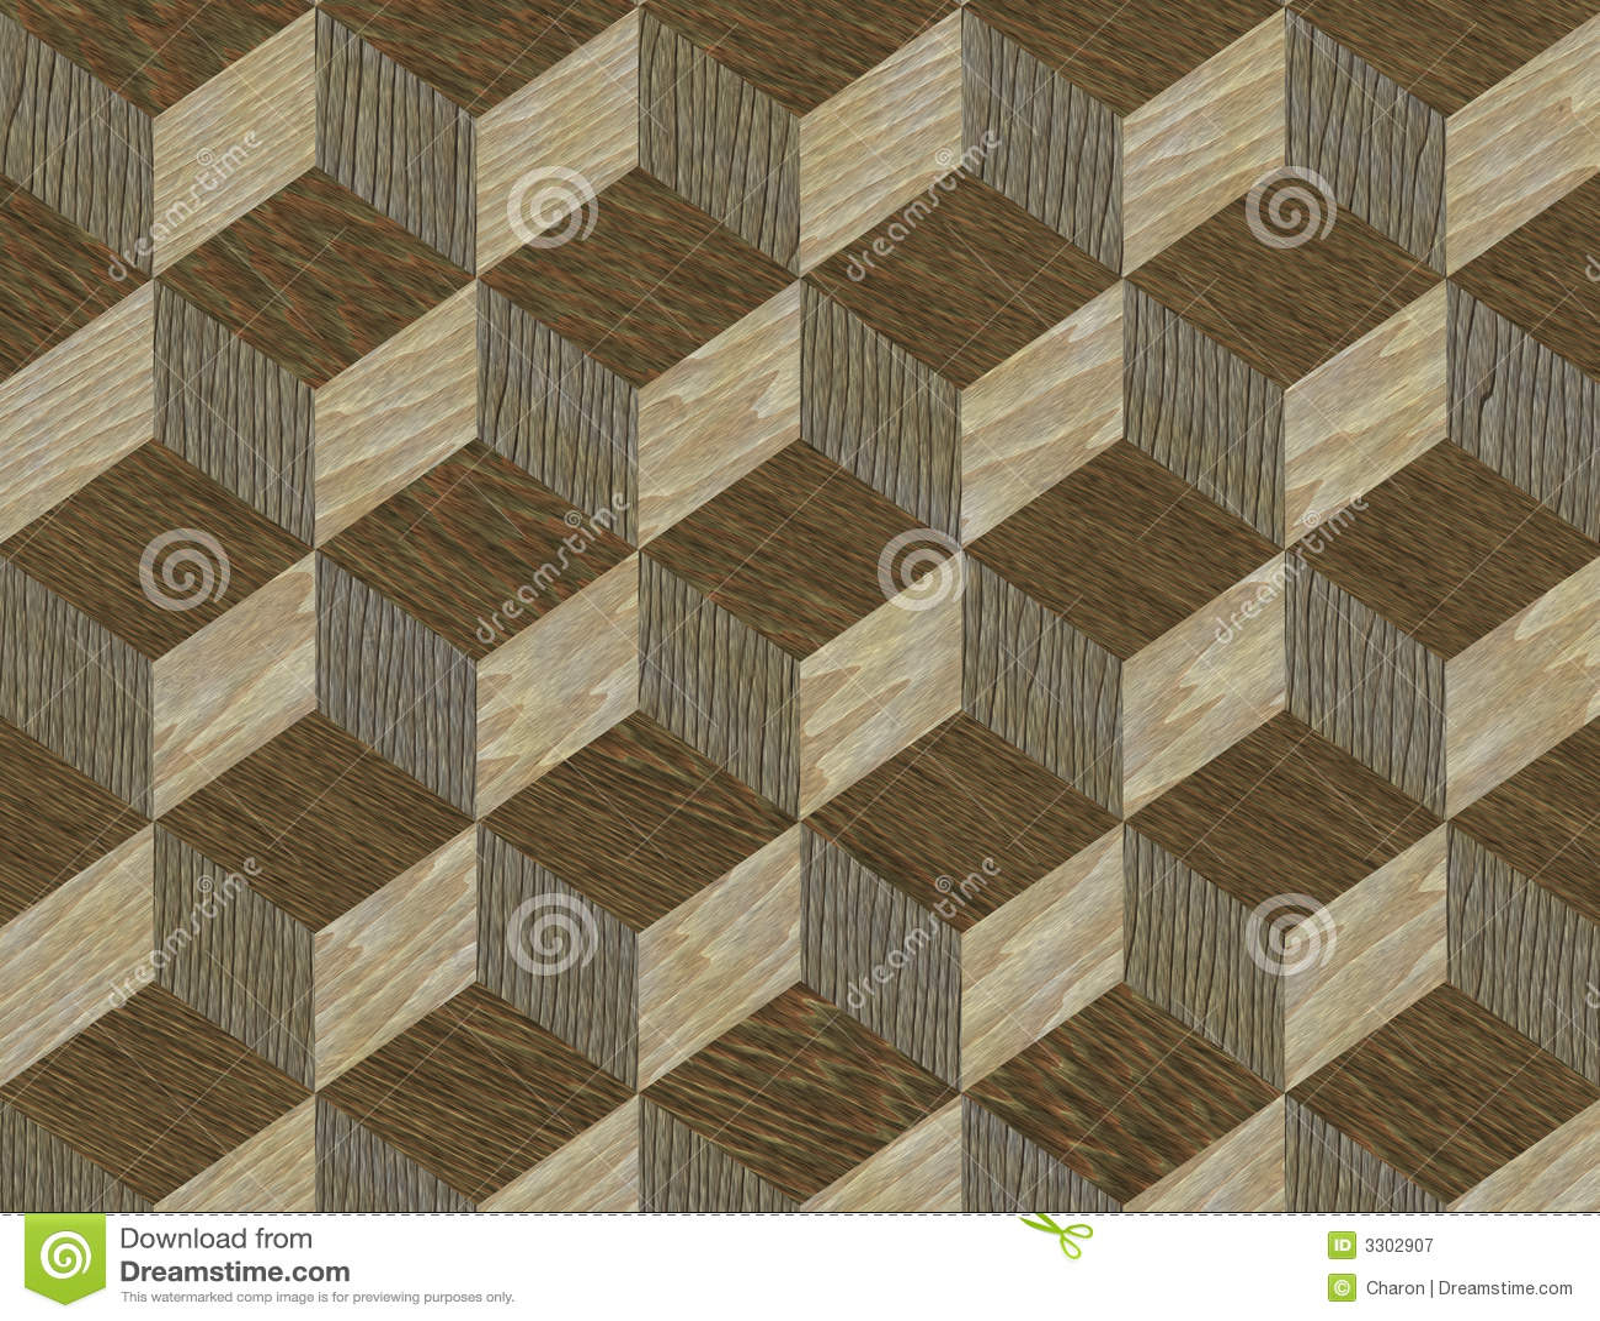 Inlay wooden pattern fine texture